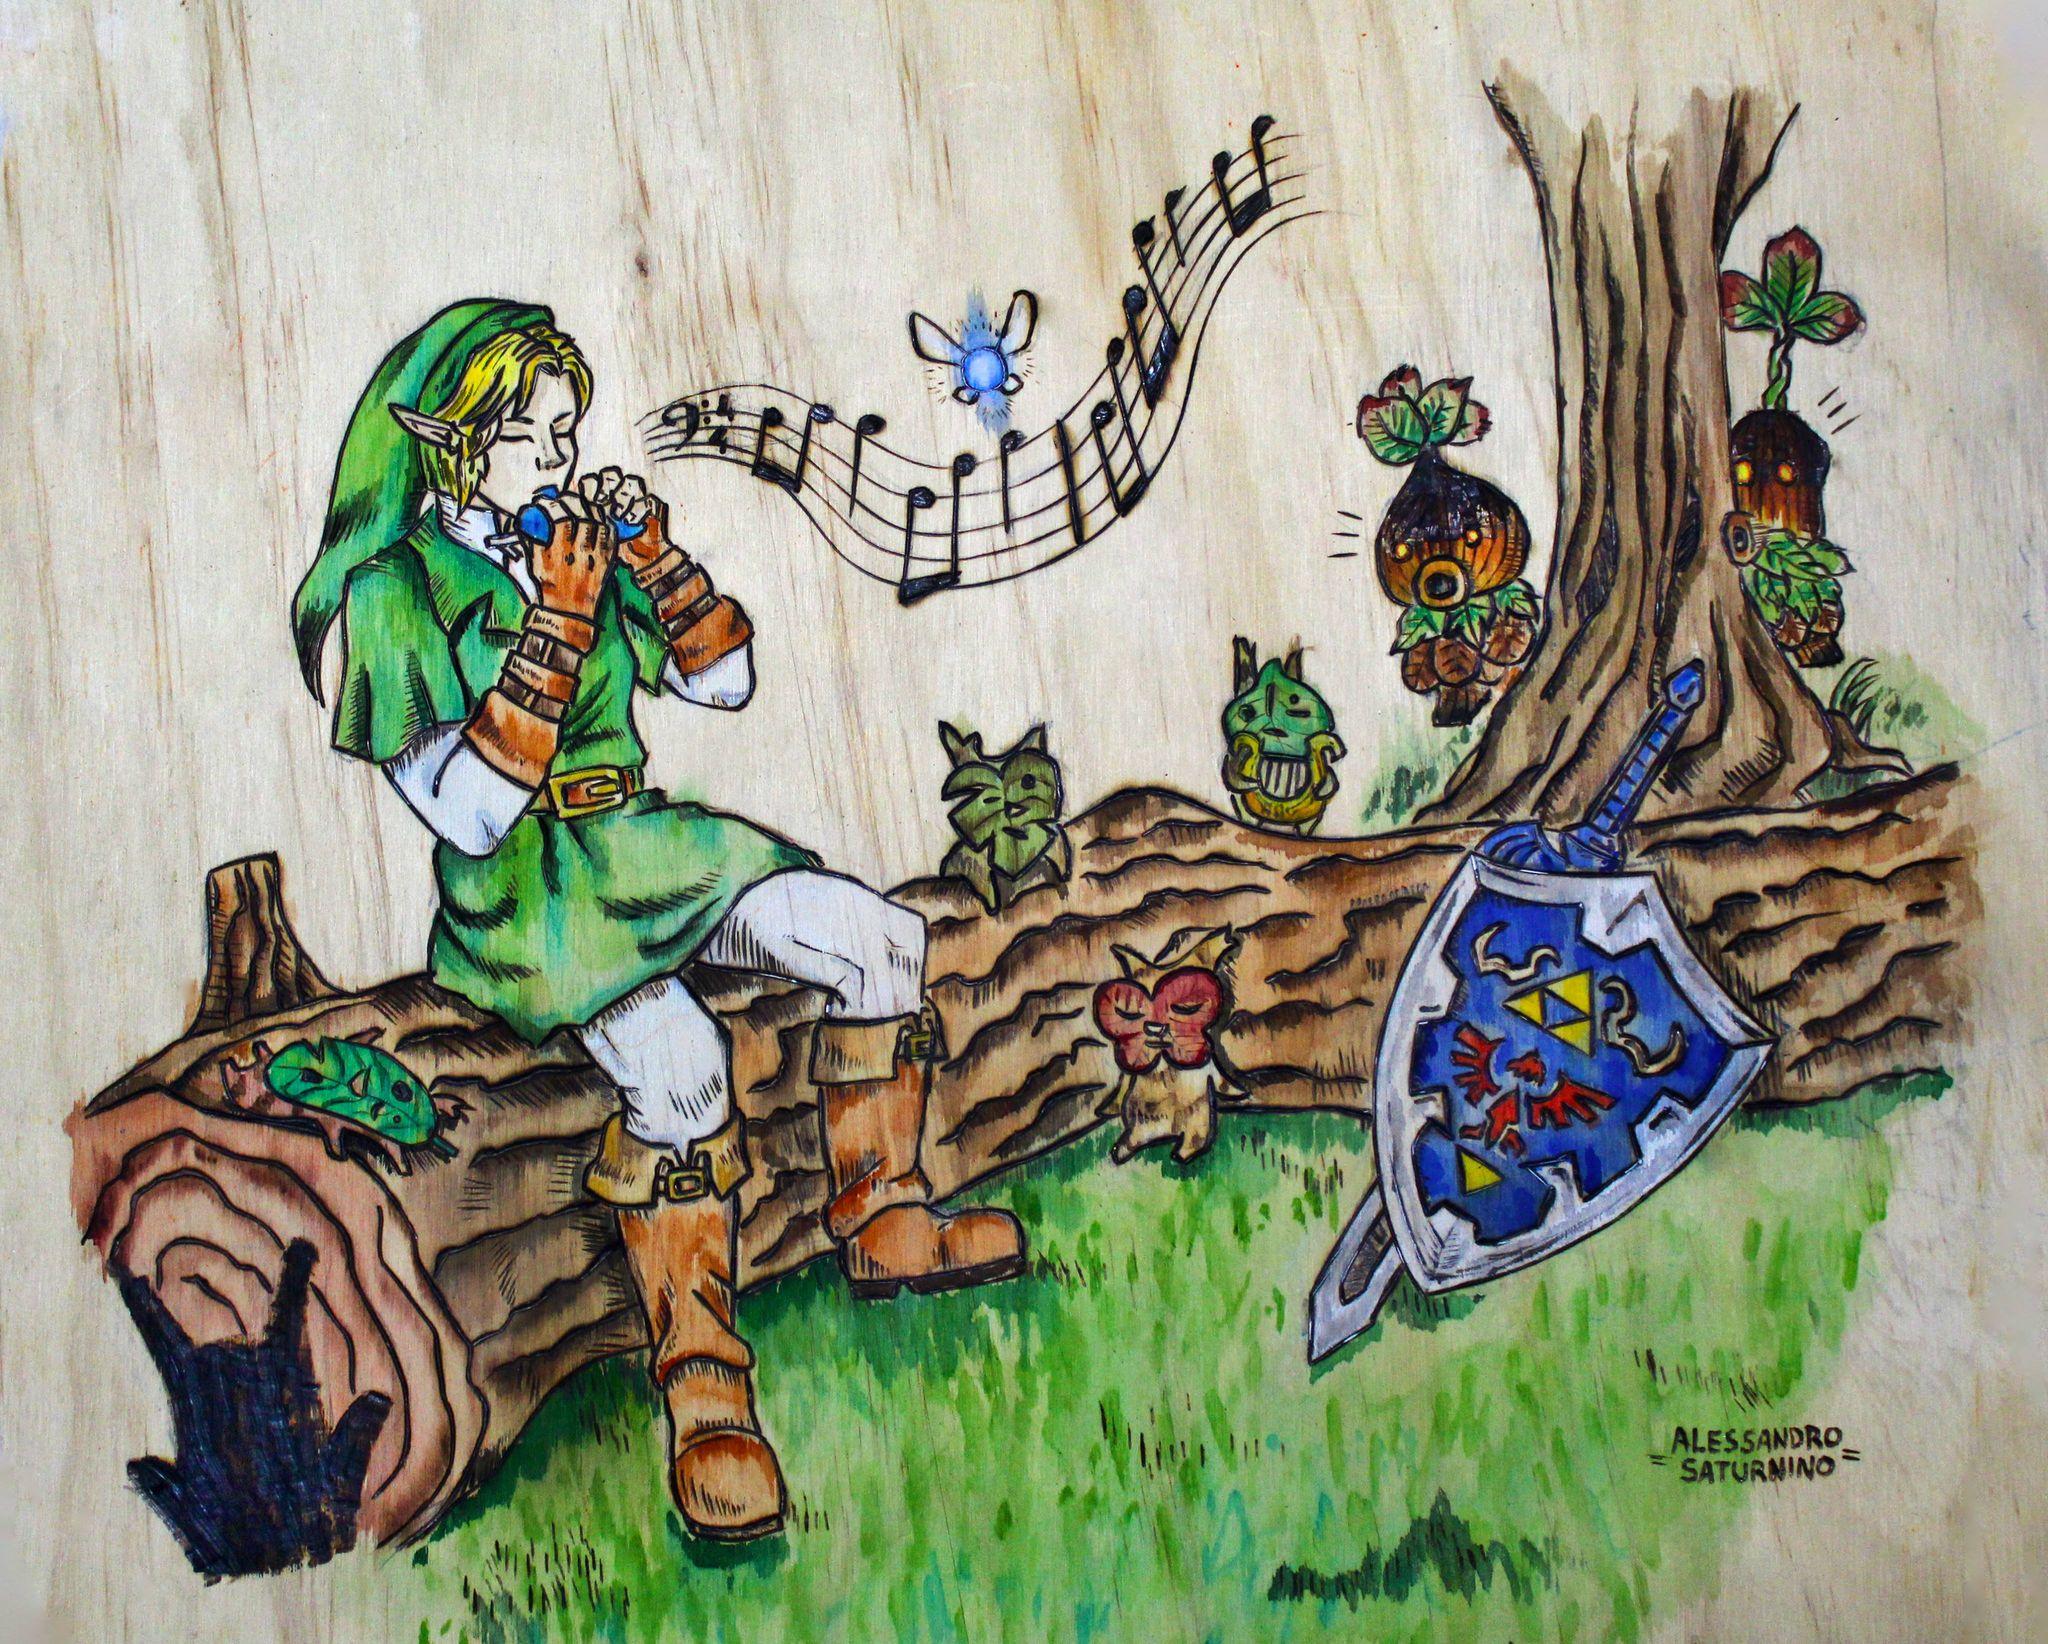 The Legend of Zelda: Skyward Sword - Premio extra: Alessandro Saturnino